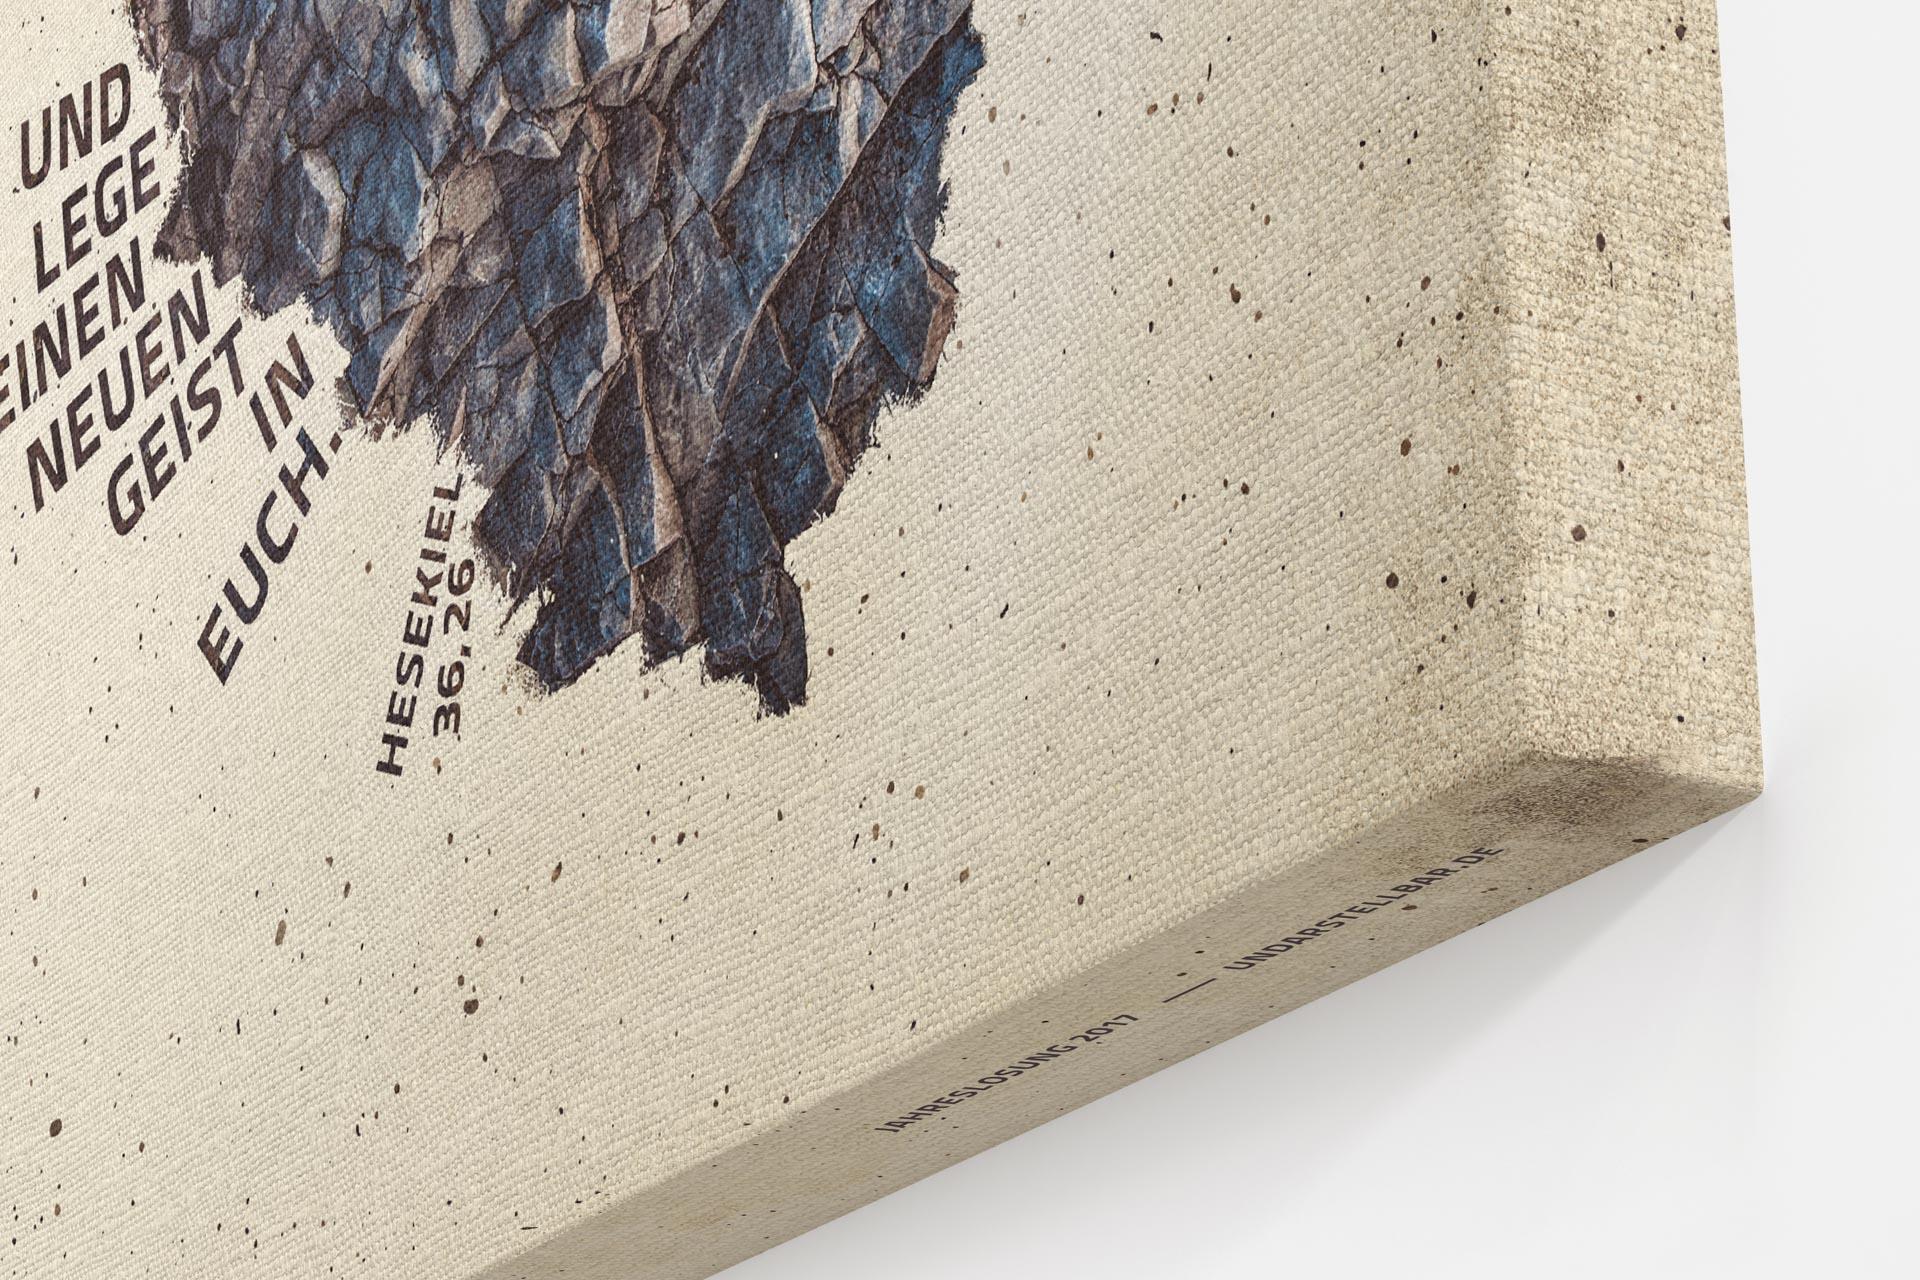 Jahreslosung 2017 Closeup Leinwand Ecke undarstellbar